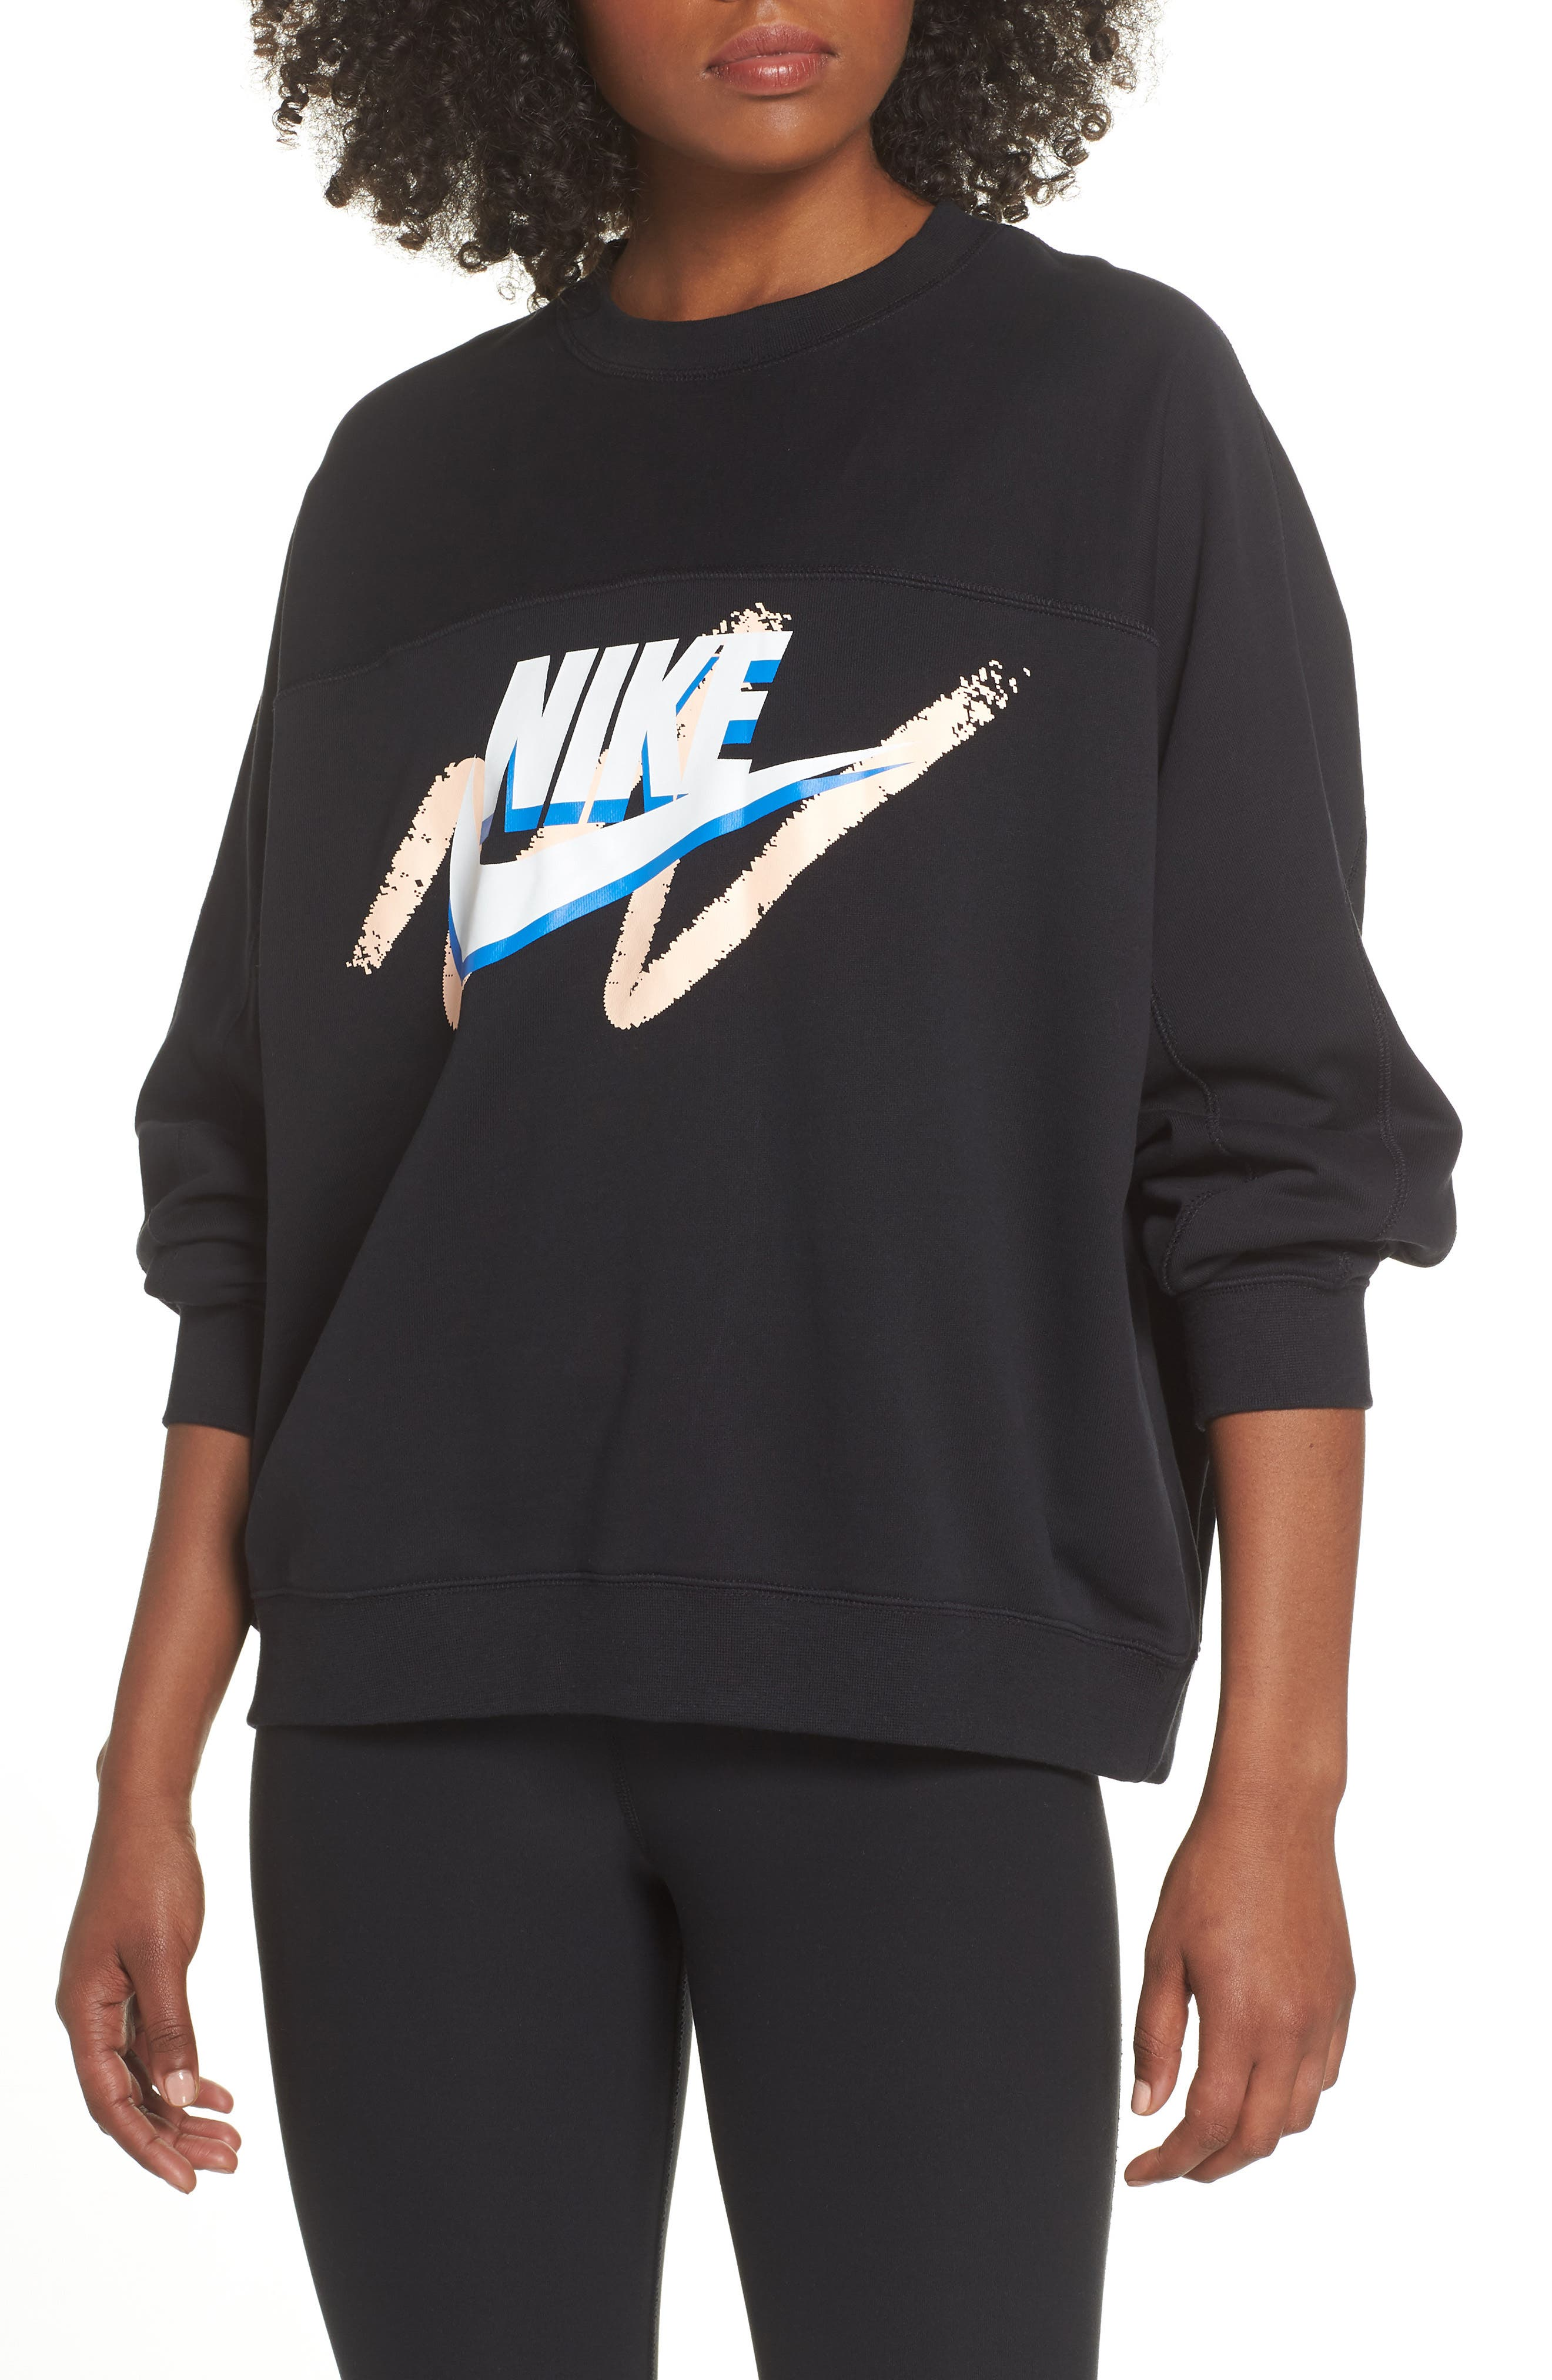 Archive Sweatshirt,                         Main,                         color, BLACK/ BLACK/ BLACK